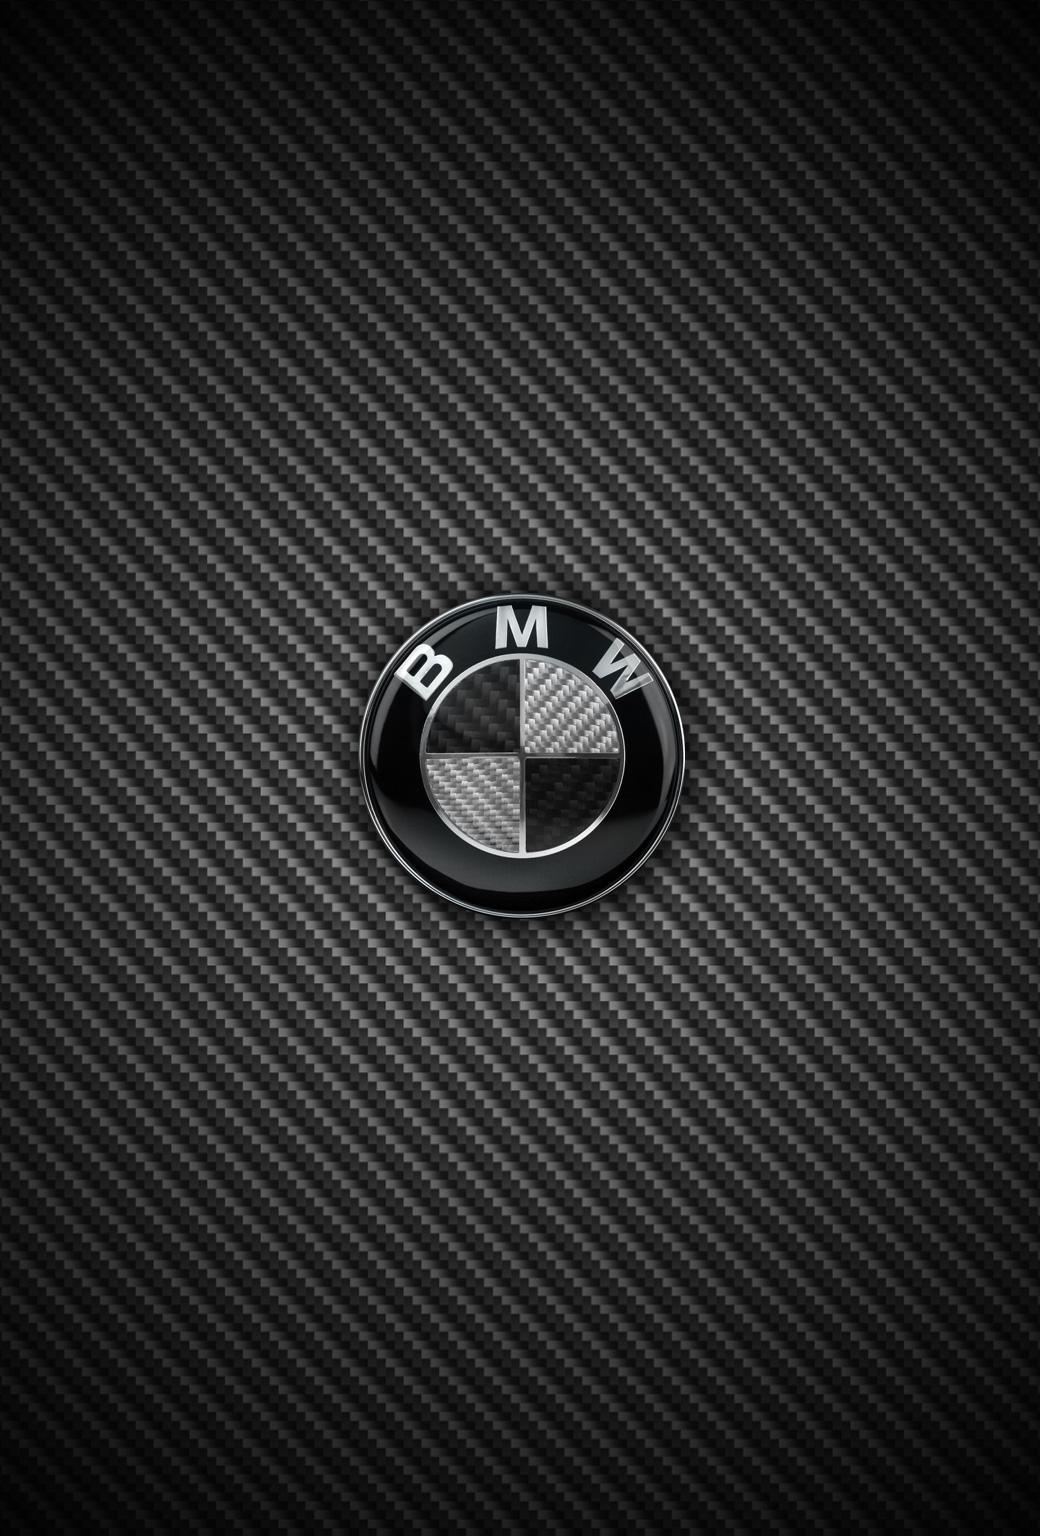 bmw-roundel-iOS7.jpg